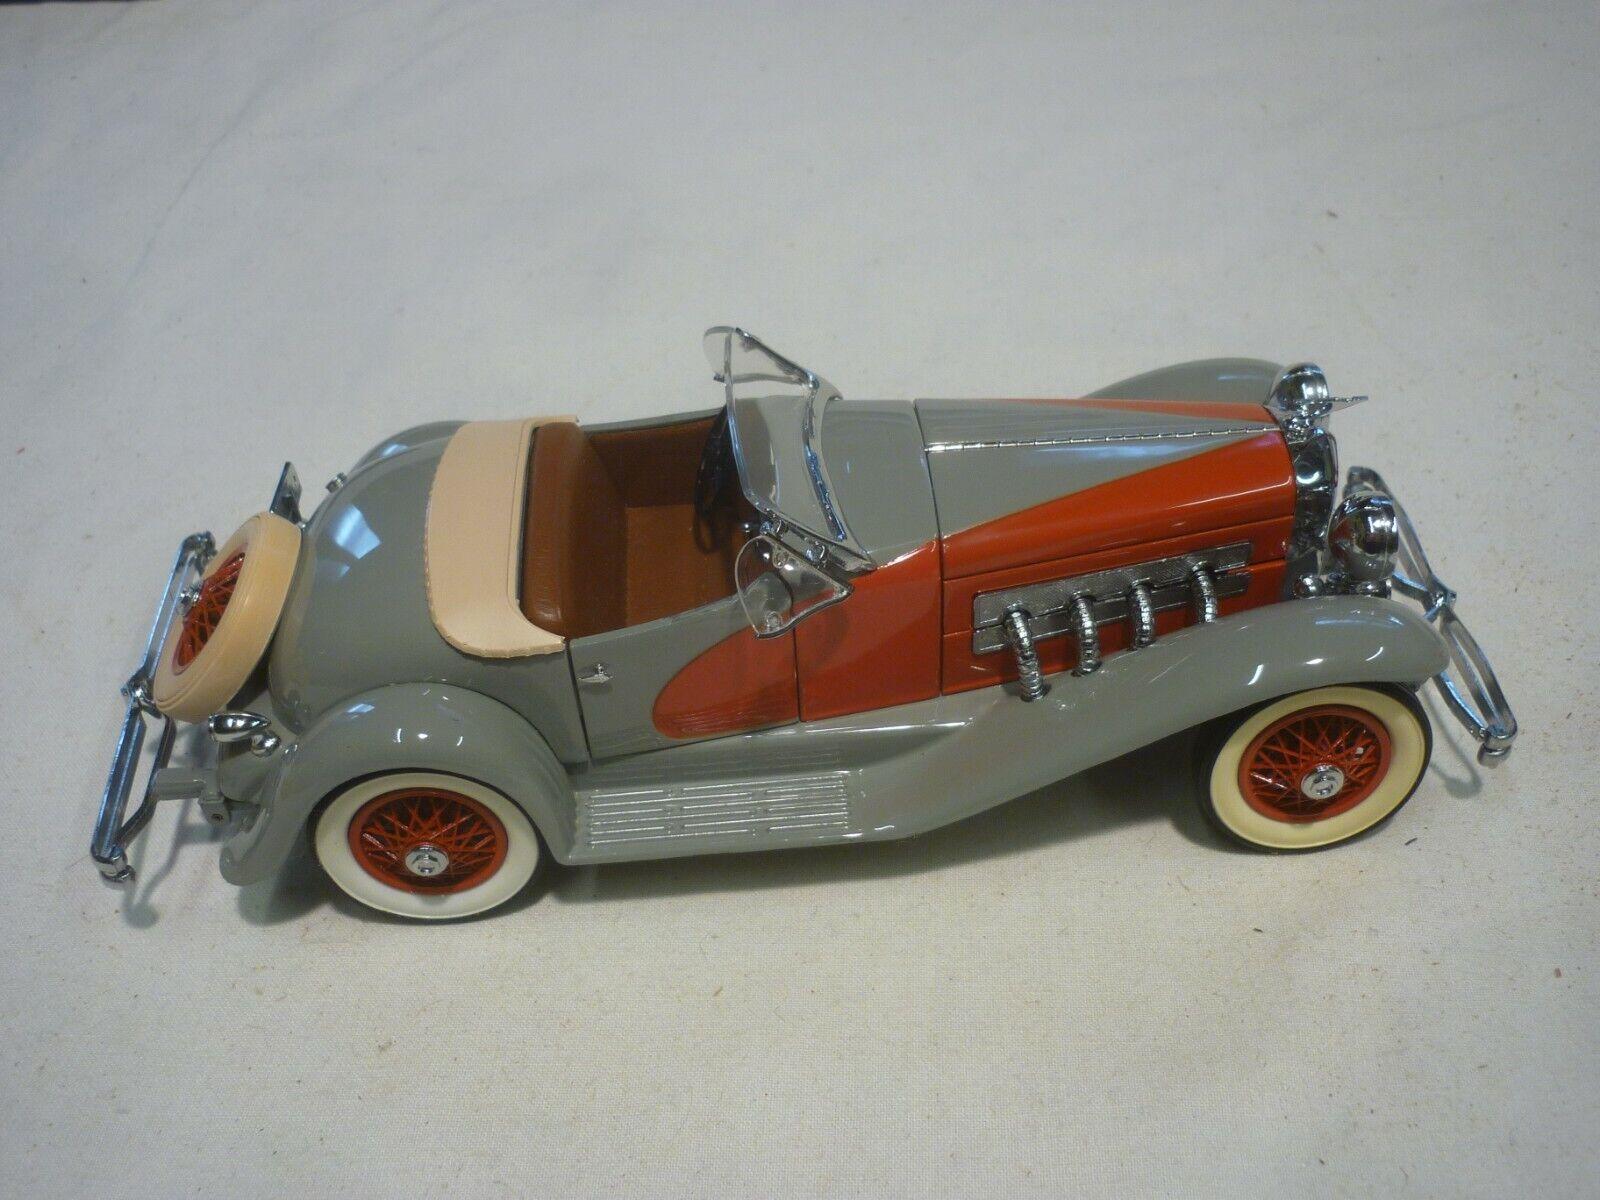 hasta un 50% de descuento Un modelo de escala de Danbury Mint de un 1935 1935 1935 Duesenberg SSJ Speedster, Sin Caja  minoristas en línea